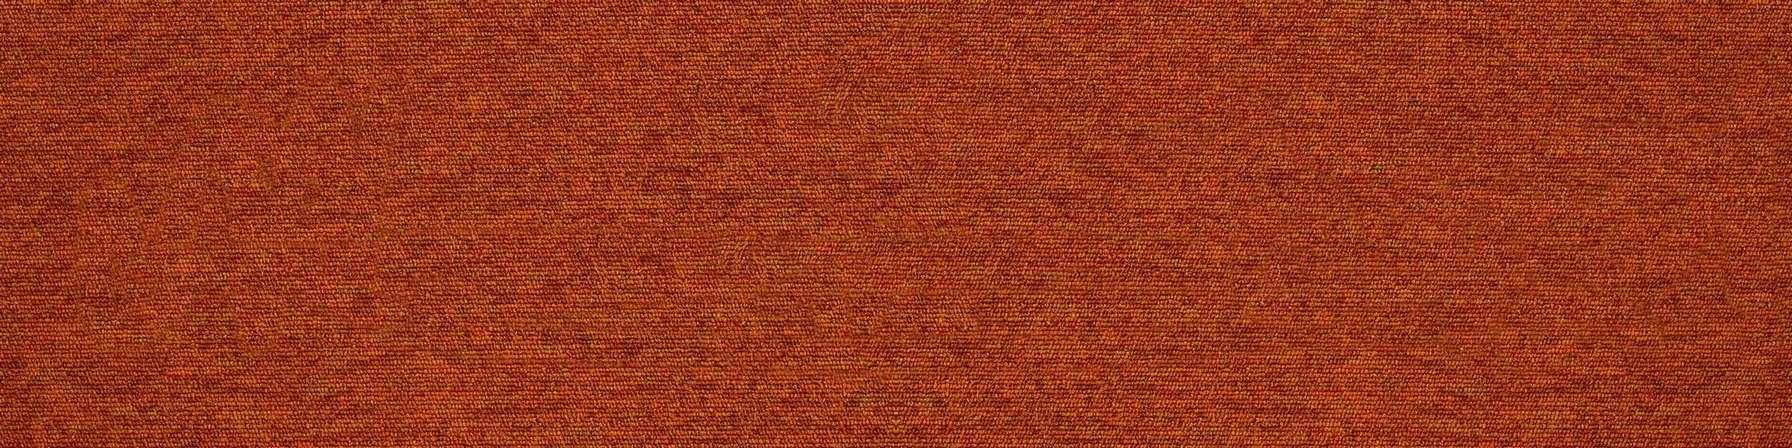 tivoli 21105 bahamas orange carpet plank